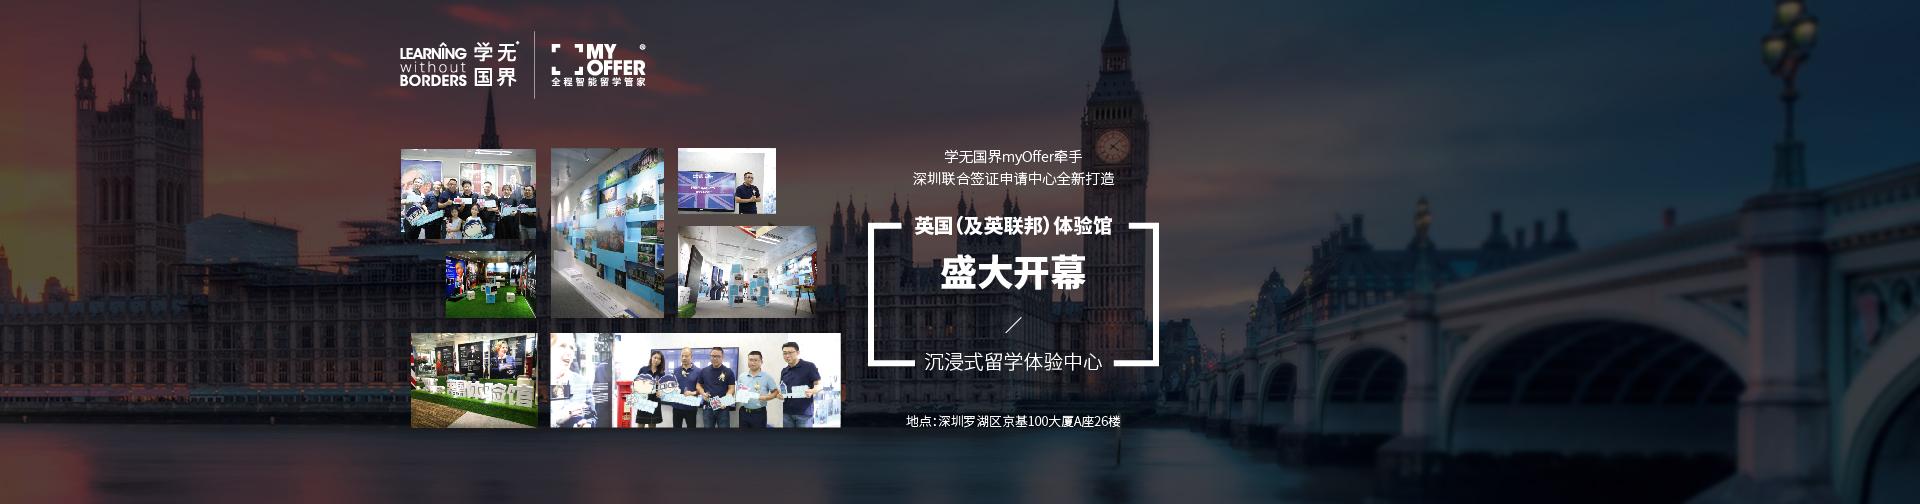 http://myoffer-public.oss-cn-shenzhen.aliyuncs.com/banners/07f40b949ca2199fe0083f0f9858220b-487069-1920x504.jpeg